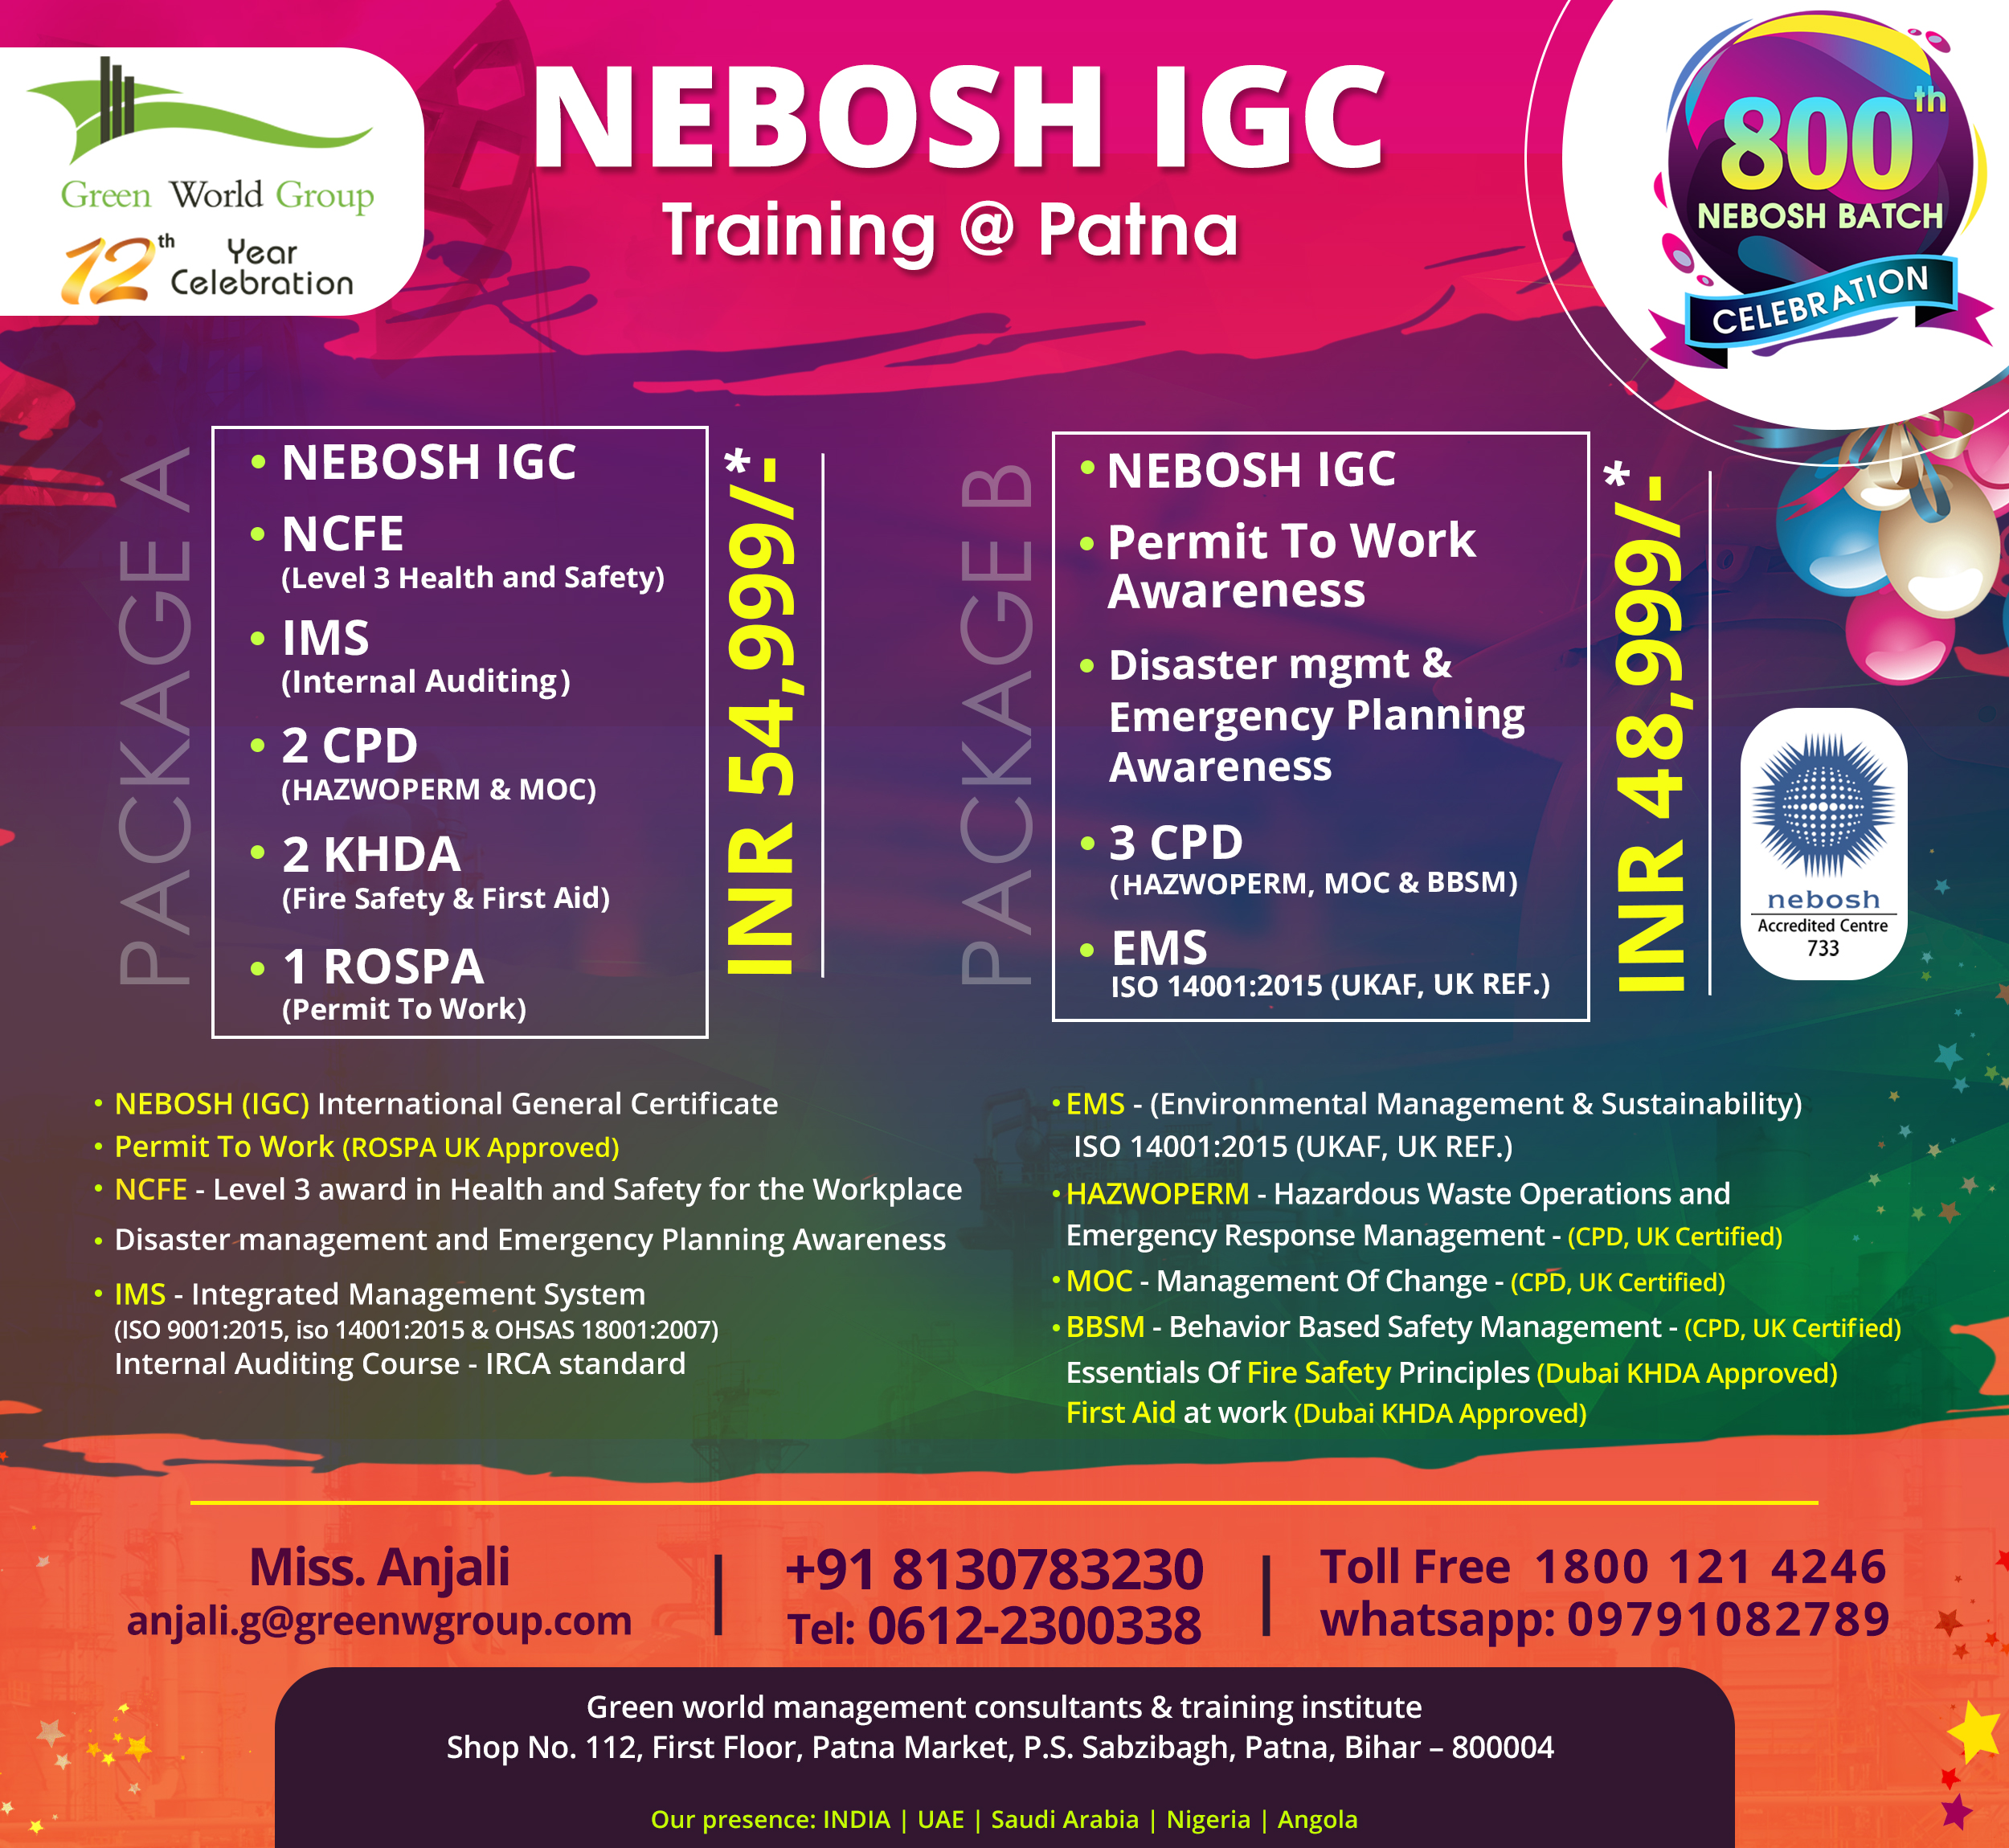 NEBOSH-IGC course in Patna